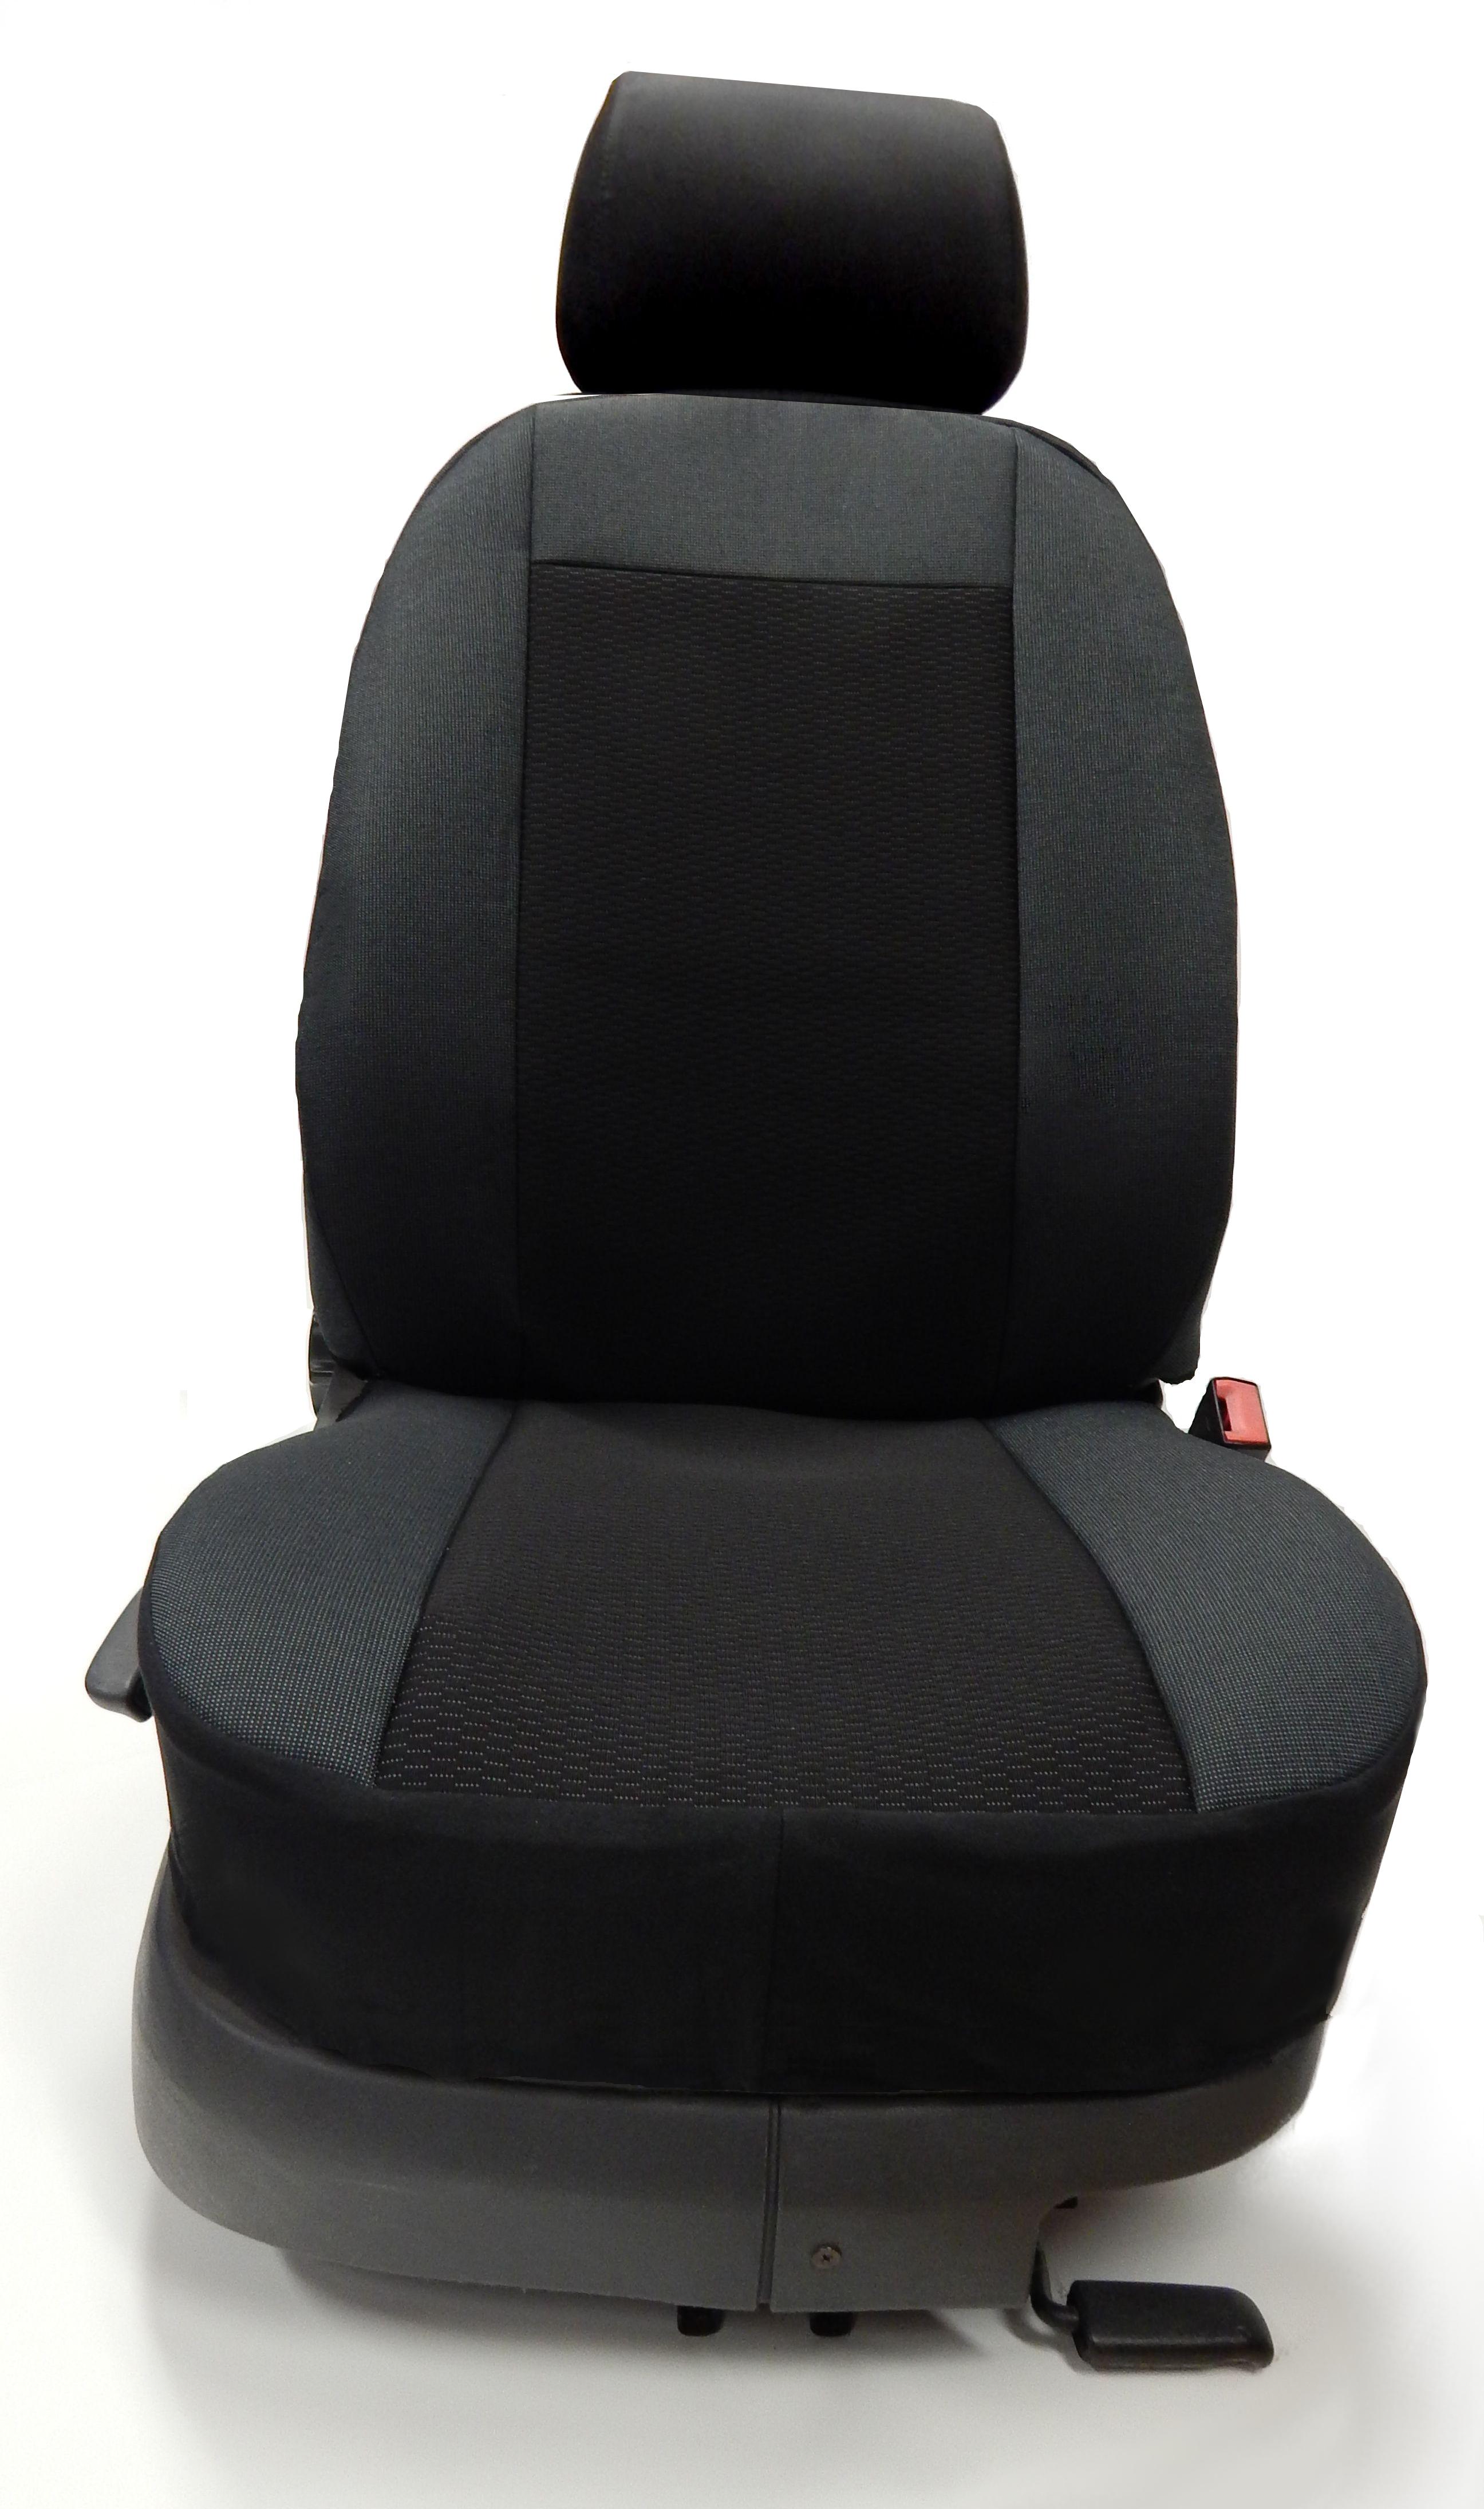 Potahy sedadel UNI II (135cm) sedák + opěradlo dělené  85cm/50cm